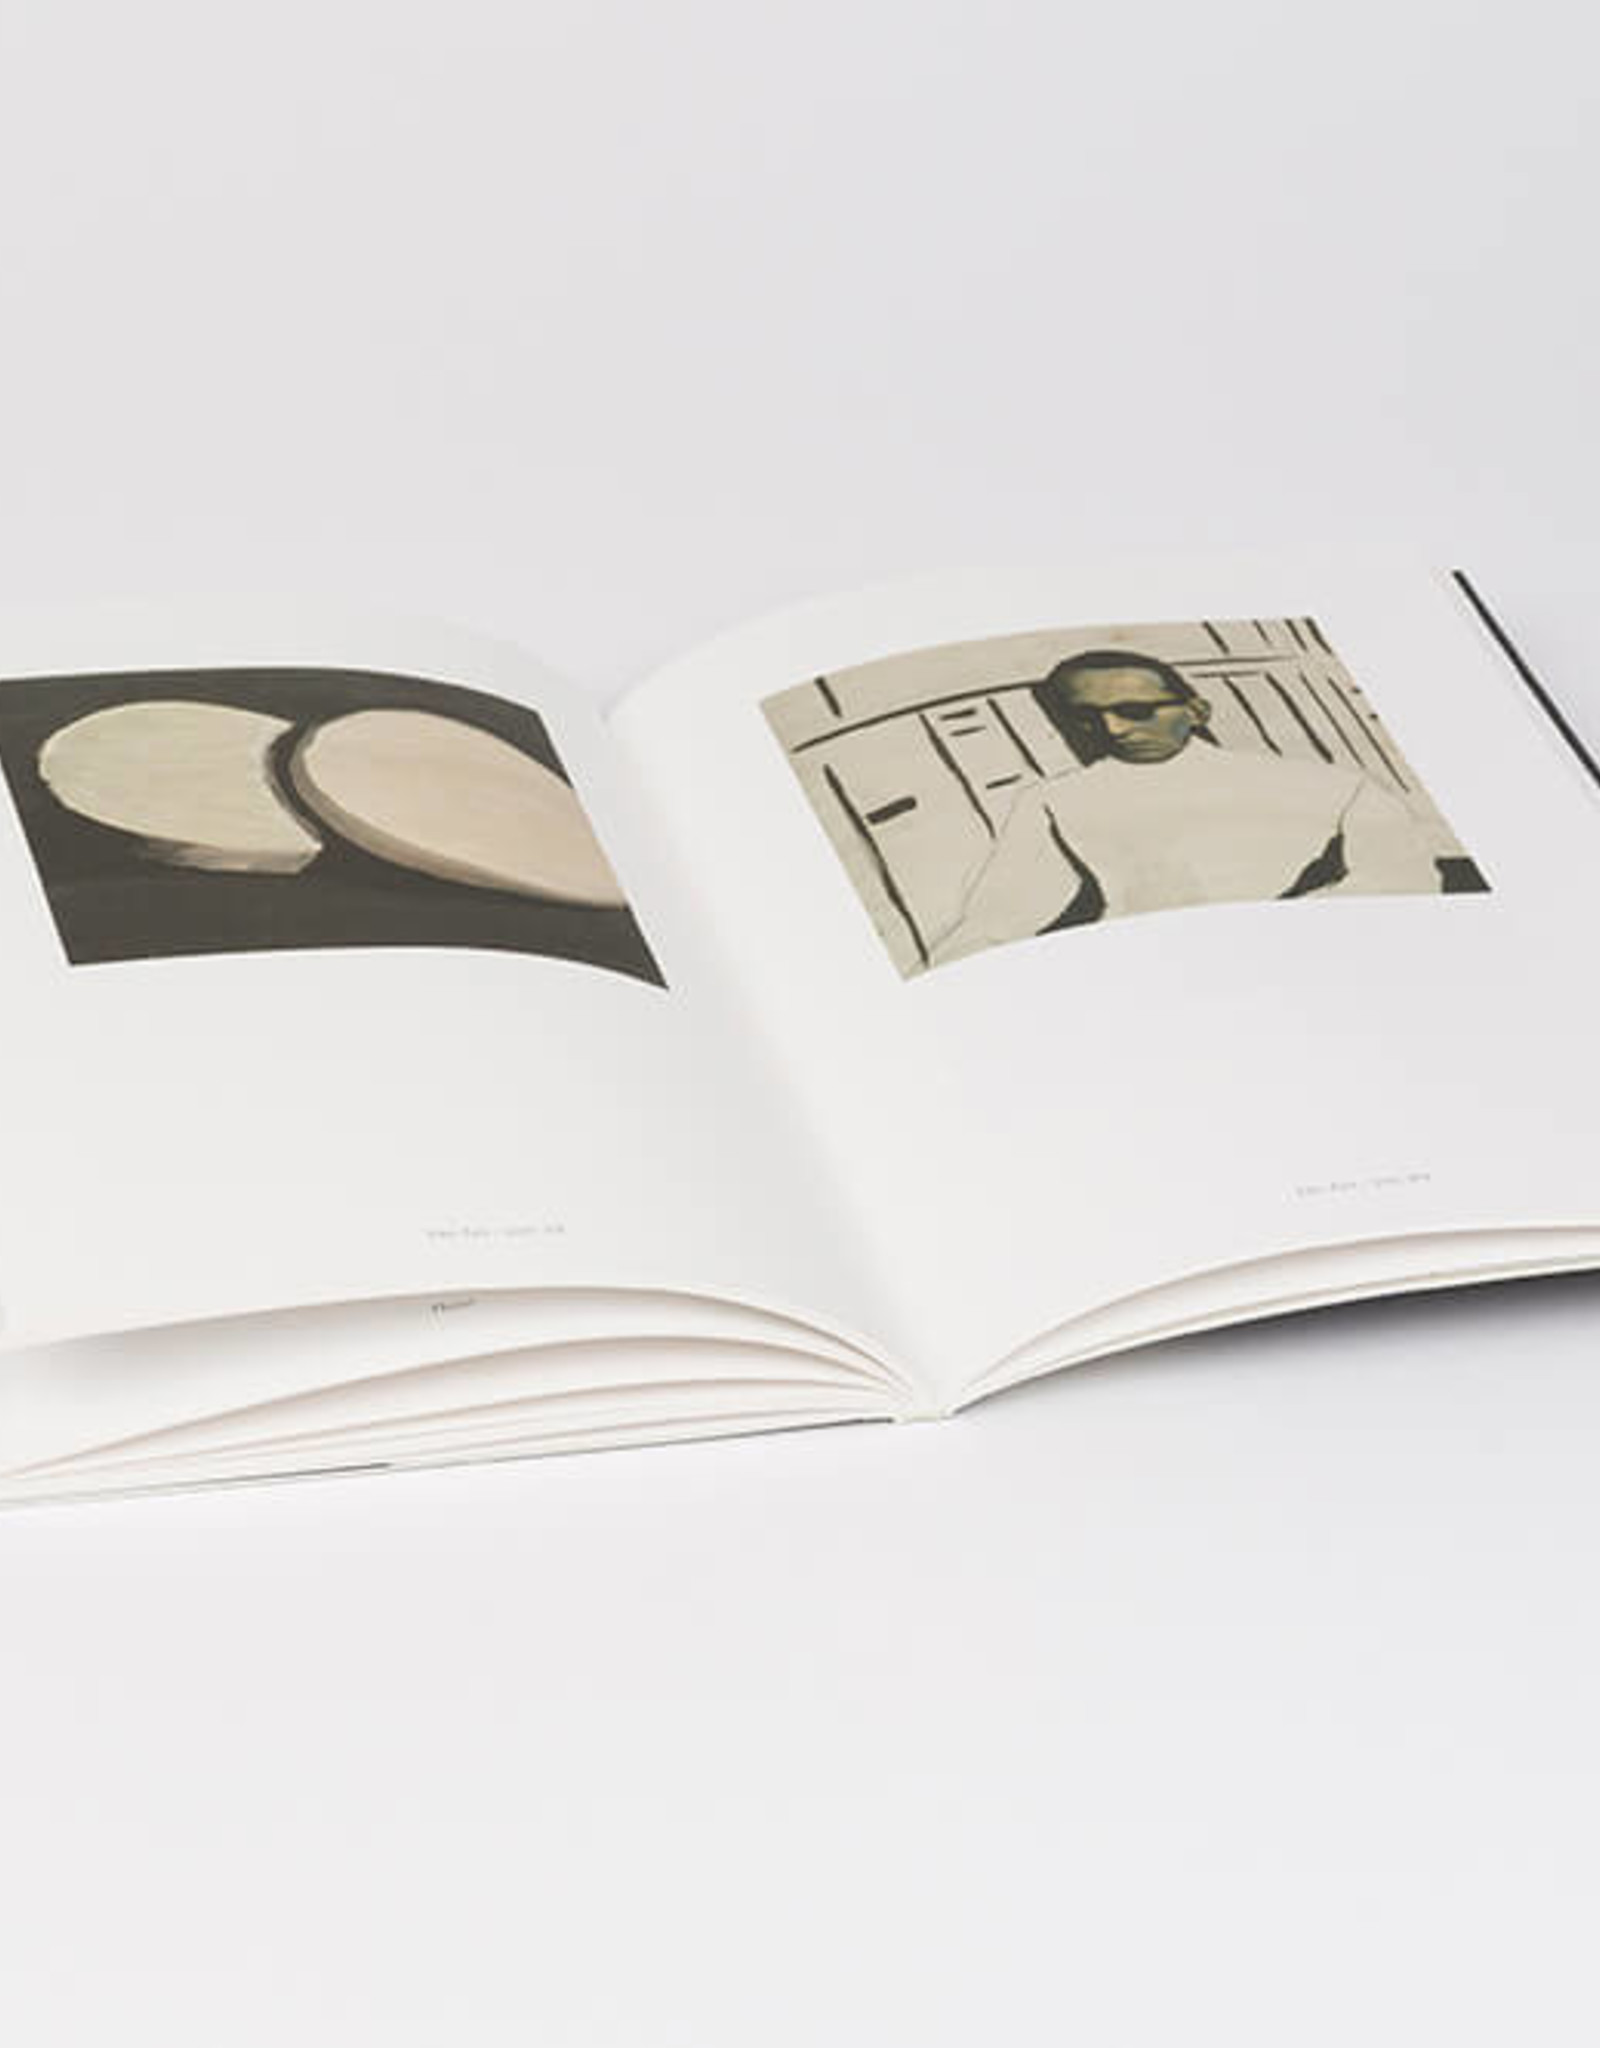 Luc Tuymans - catalogue Budapest & Warsaw